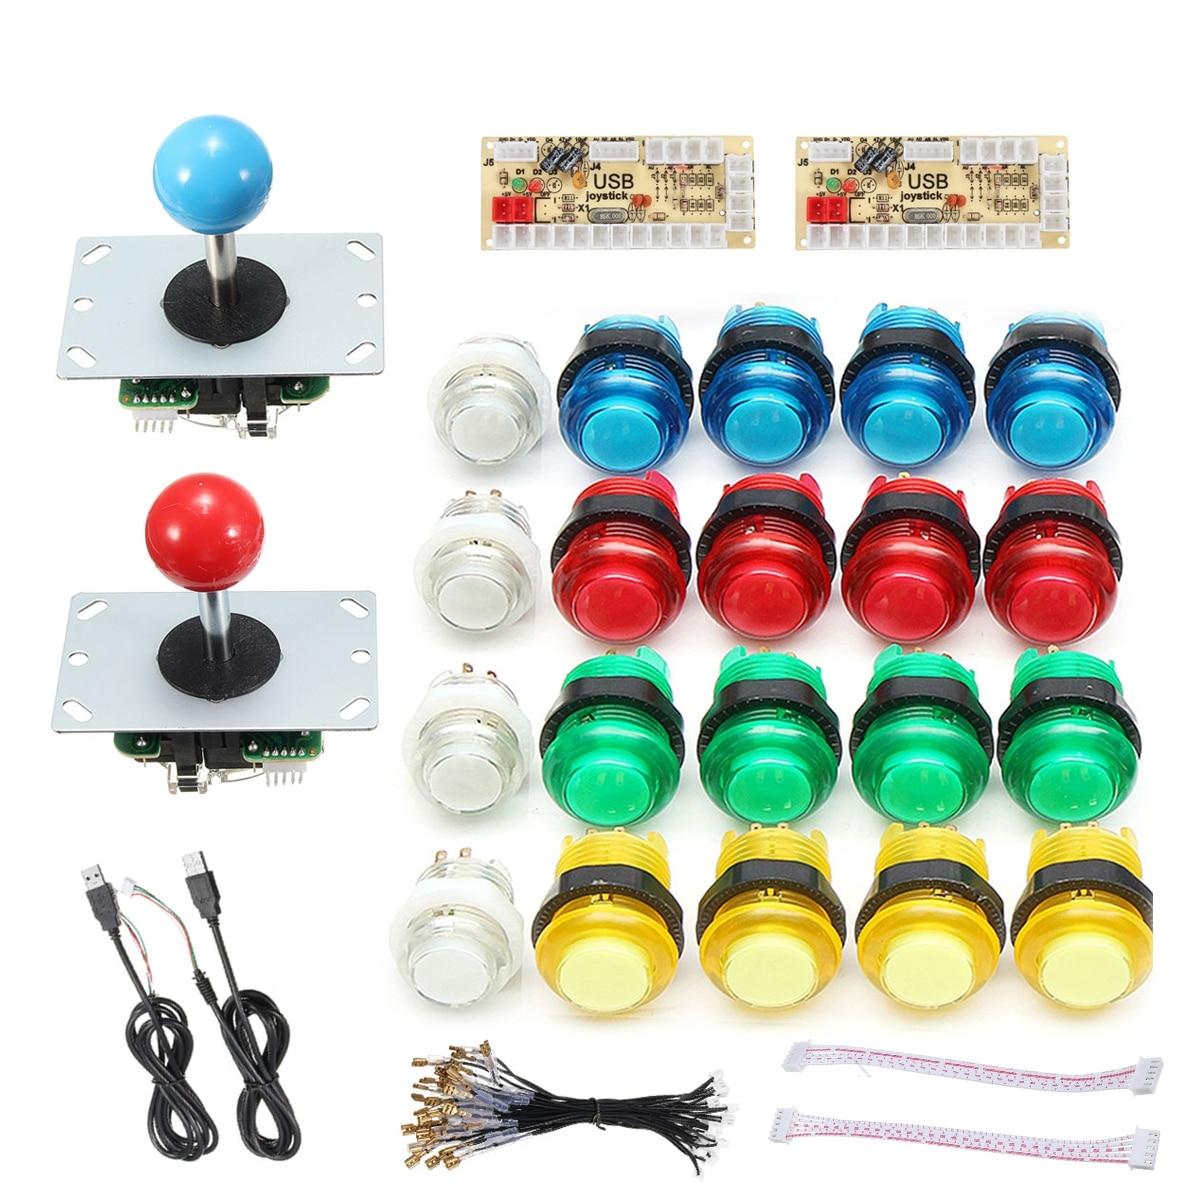 2 joueurs bricolage Kits de Joystick d'arcade avec 20 boutons d'arcade de LED + 2 Joysticks + 2 Kit d'encodeur USB + câbles jeu d'arcade Joystick